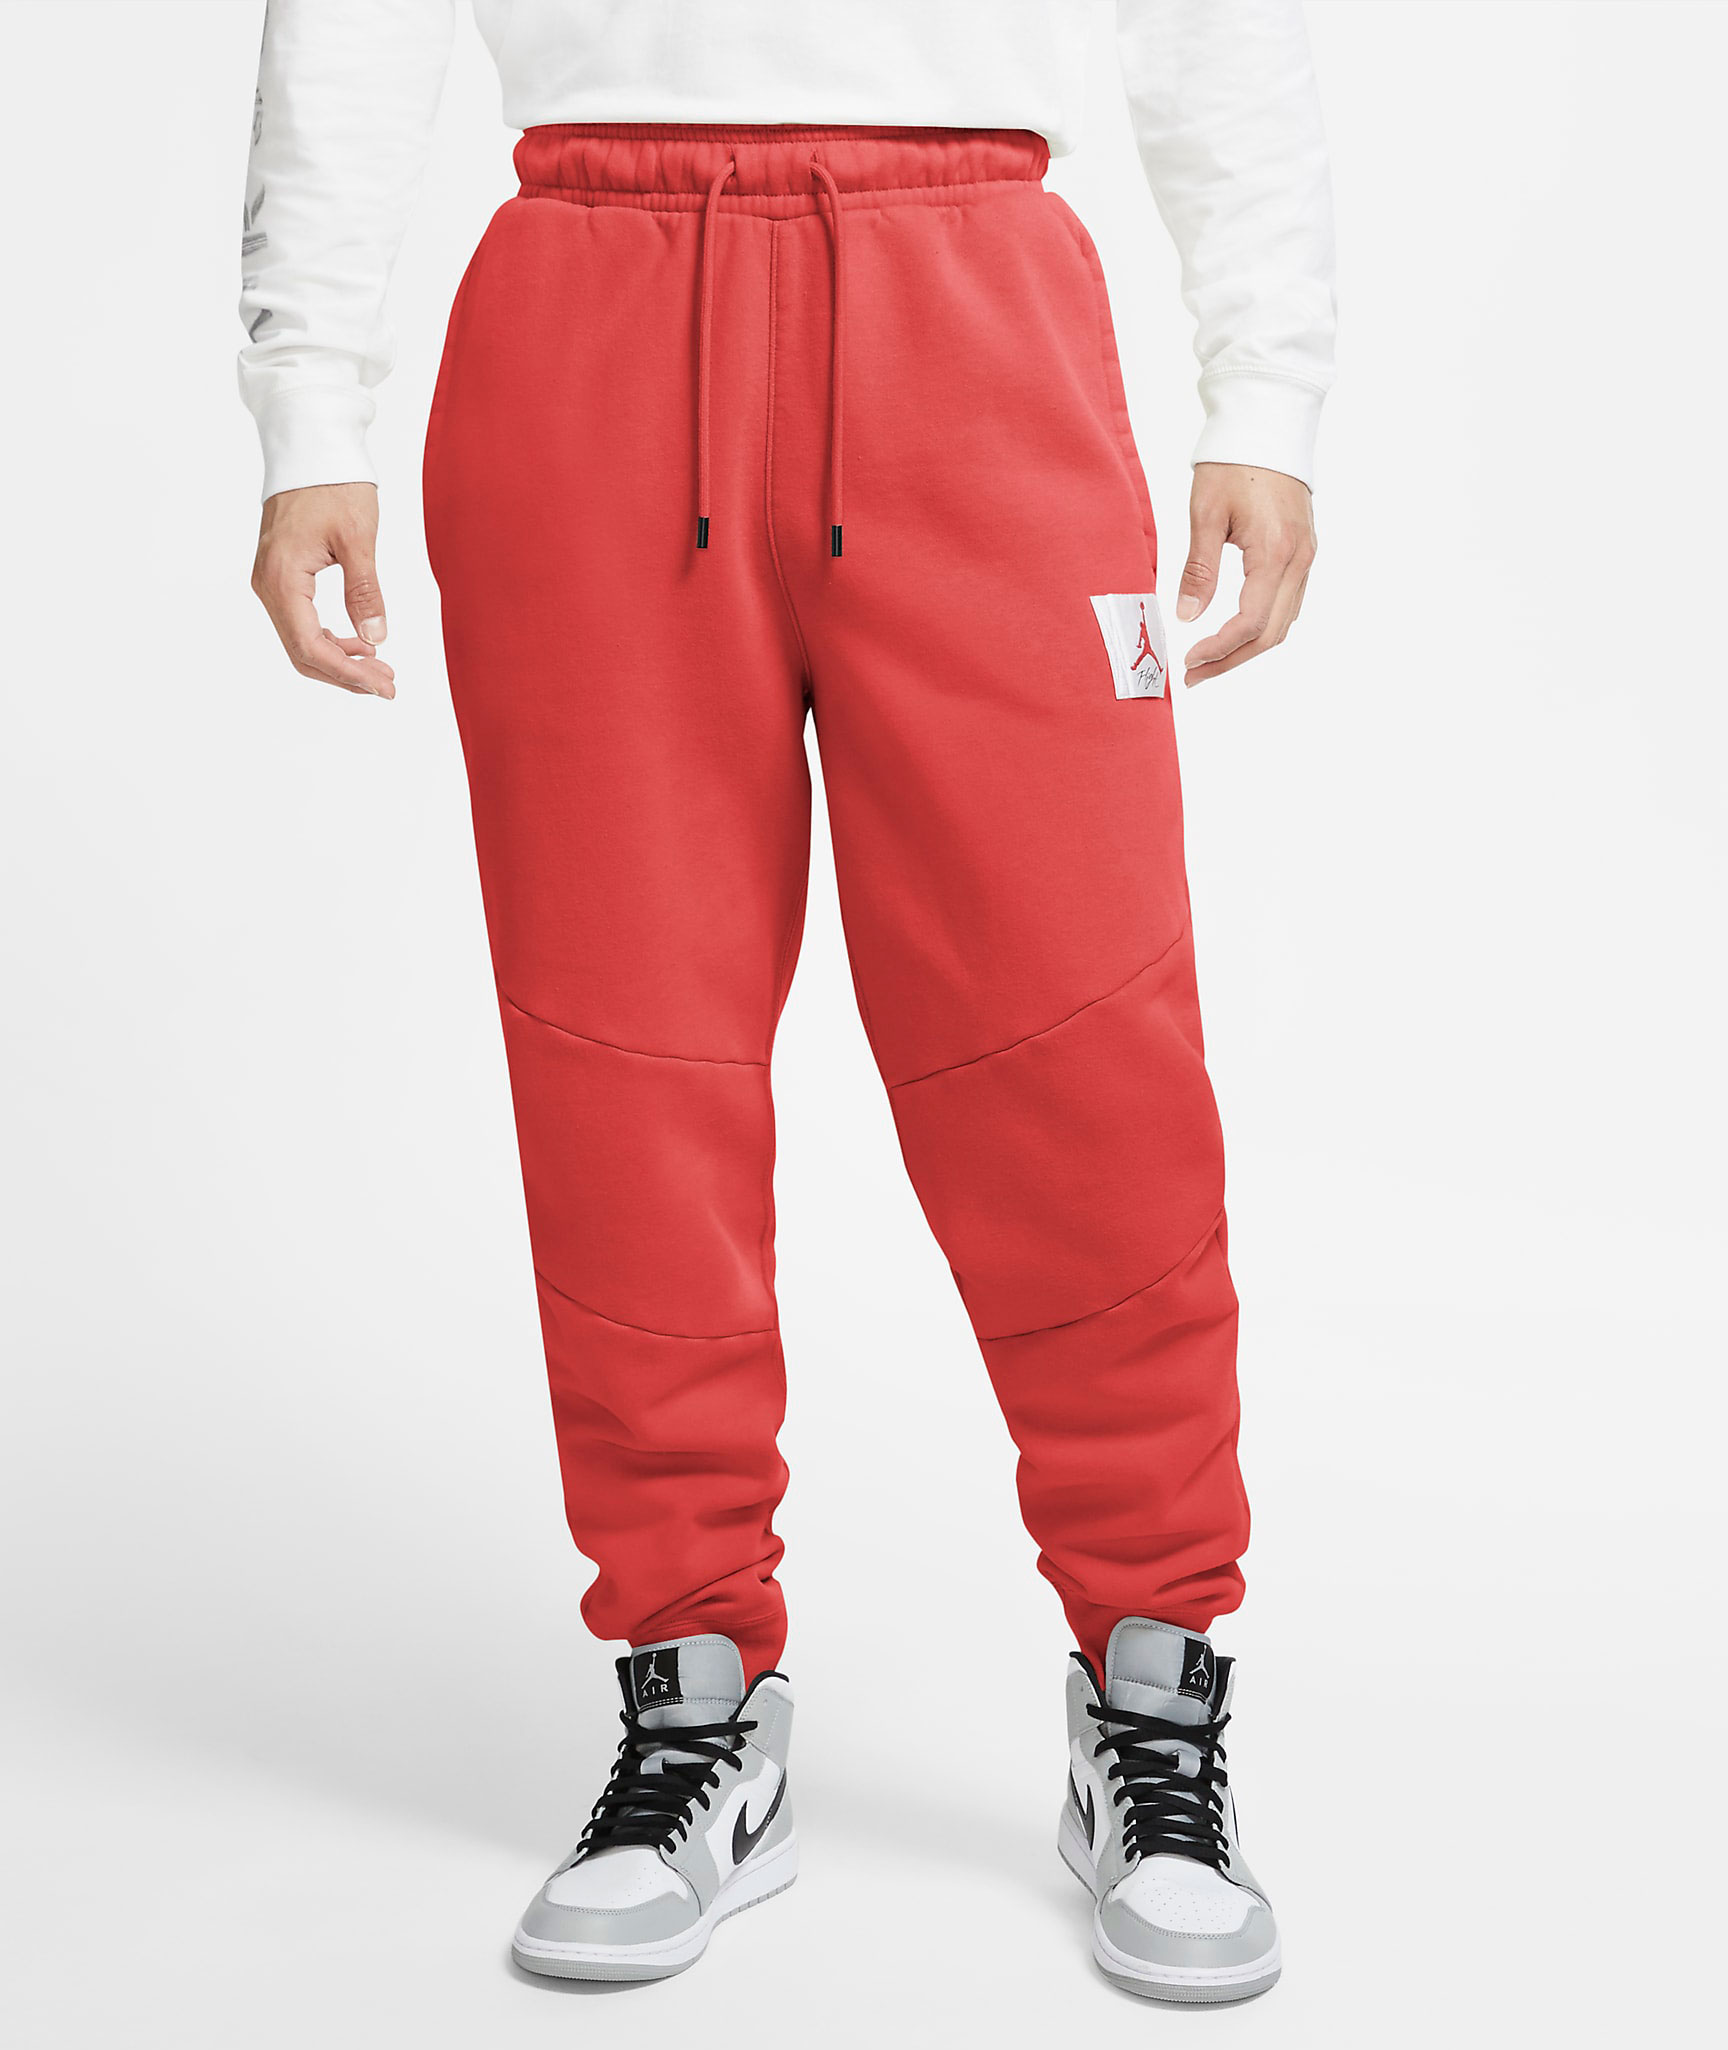 air-jordan-1-mid-track-red-pants-match